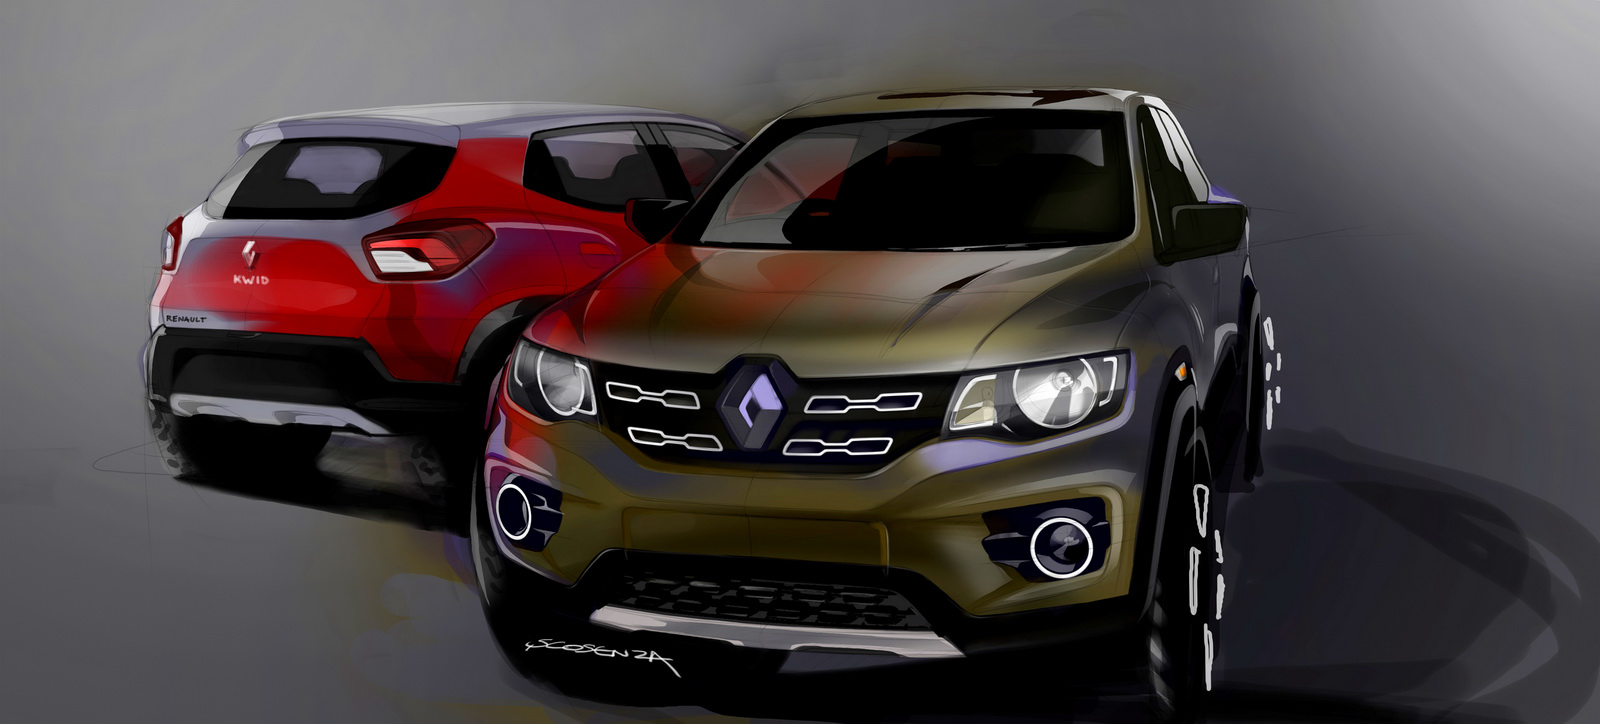 Renault Kwid, crossover Pháp giá 100 triệu đồng